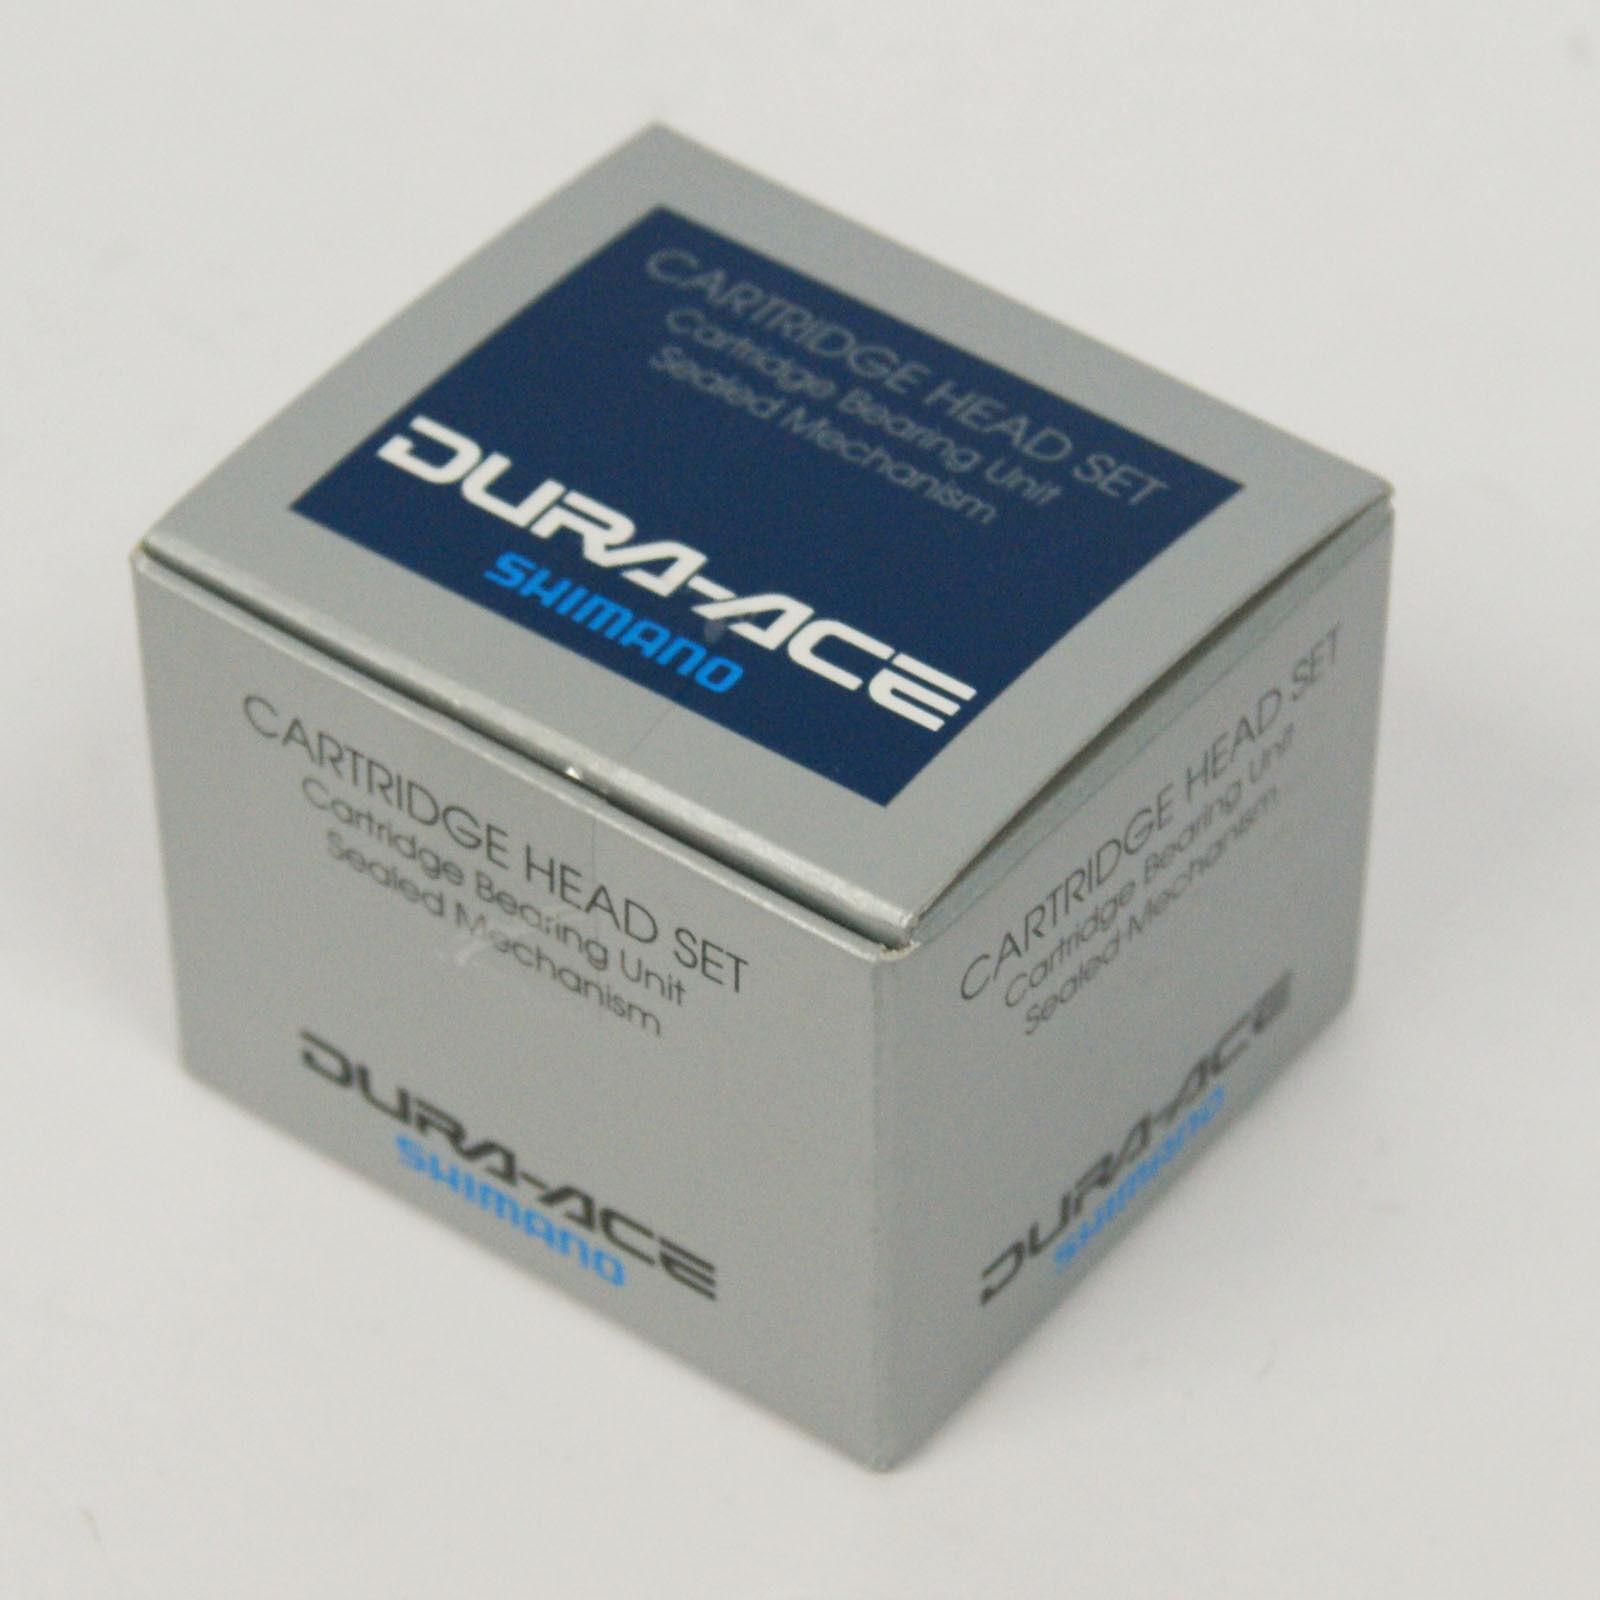 Shimano Dura-Ace Piste HP-7410 Tête Pièces Jis ( Njs ) IHP7410J